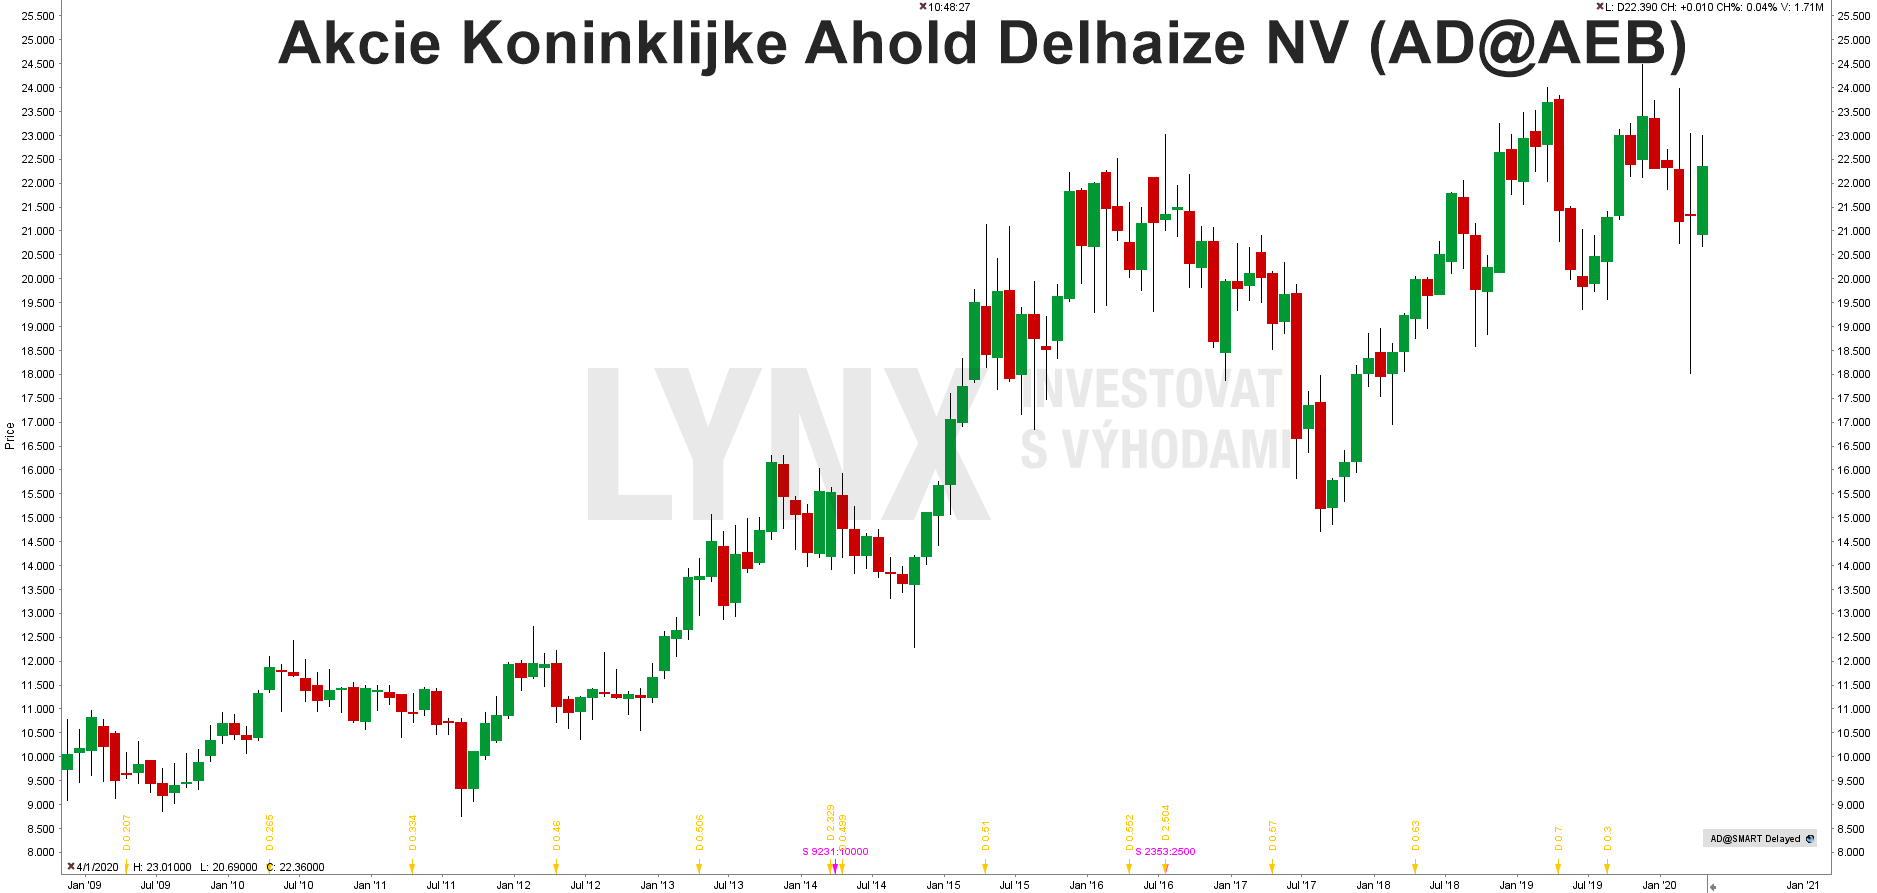 Graf akcie Ahold Delhaize